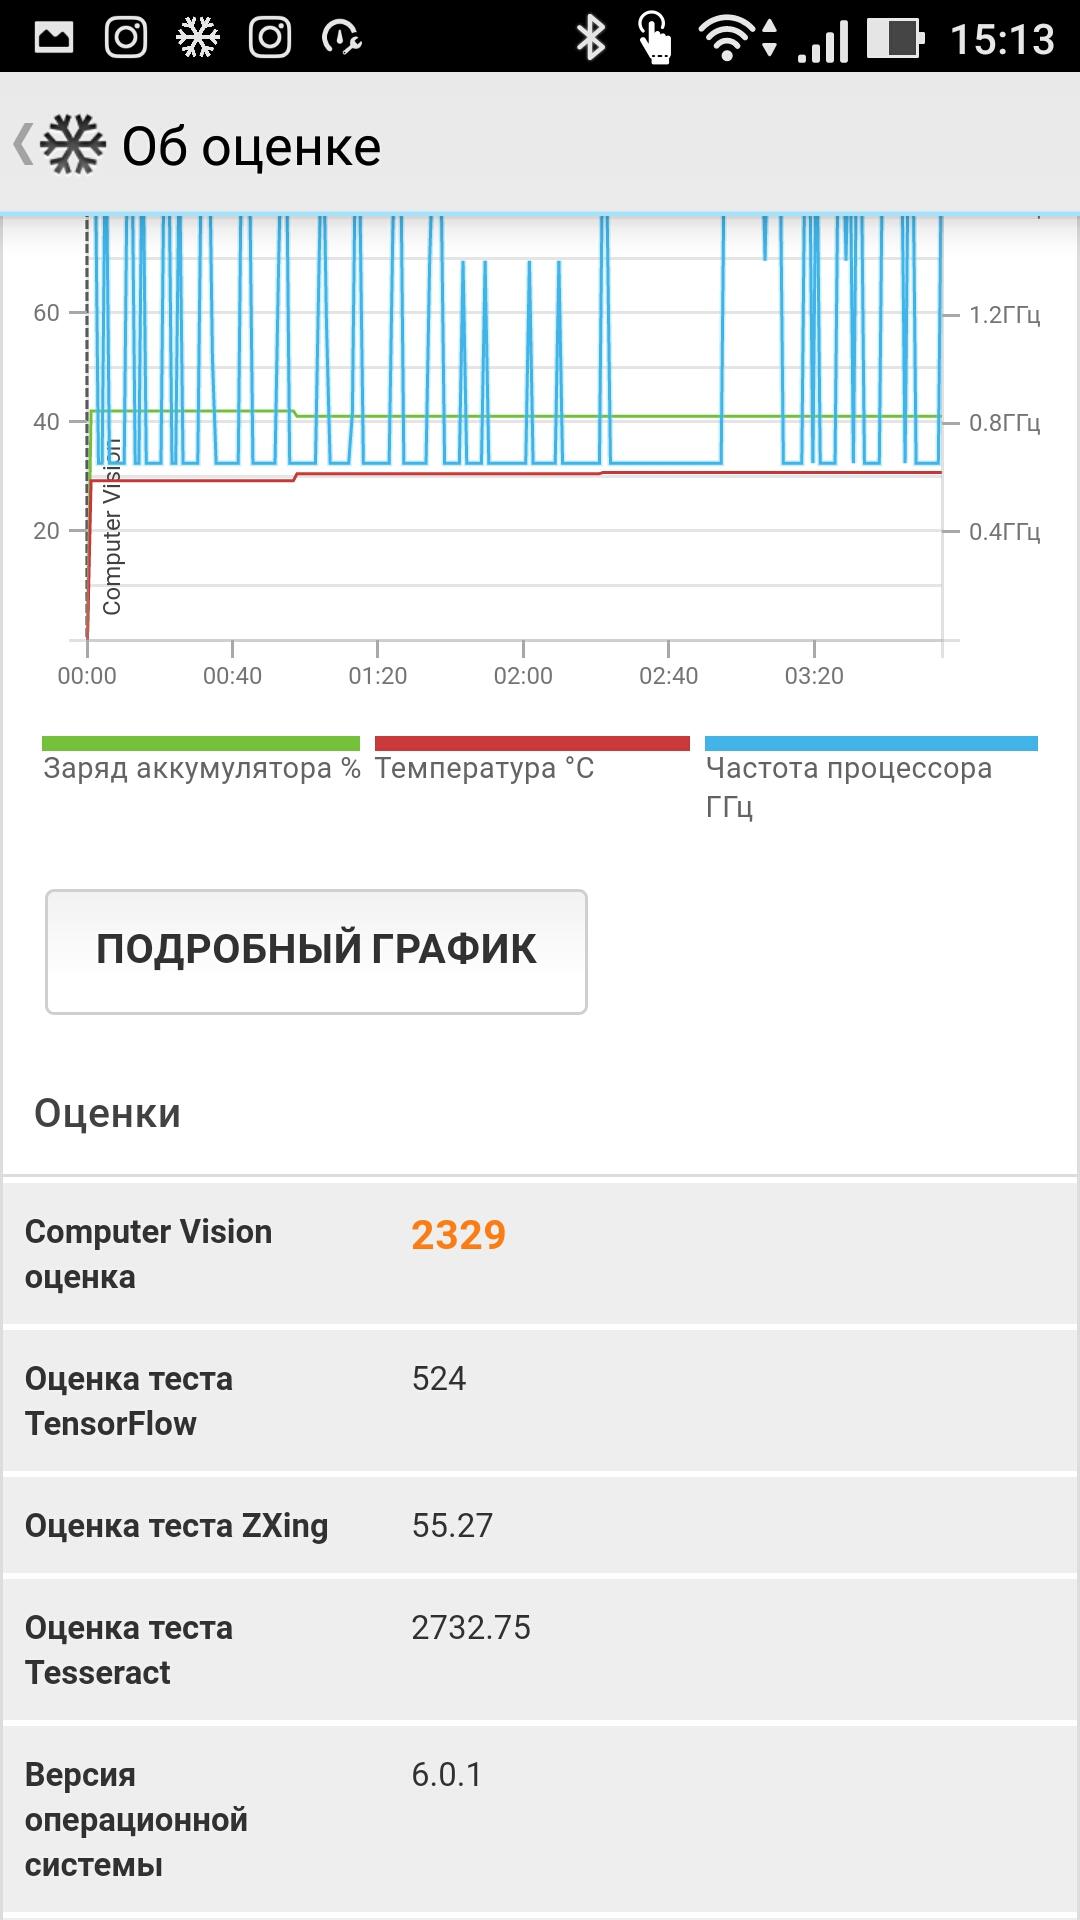 PCMark Computer Vision ASUS Zenfone 3 ZE552KL 64Gb